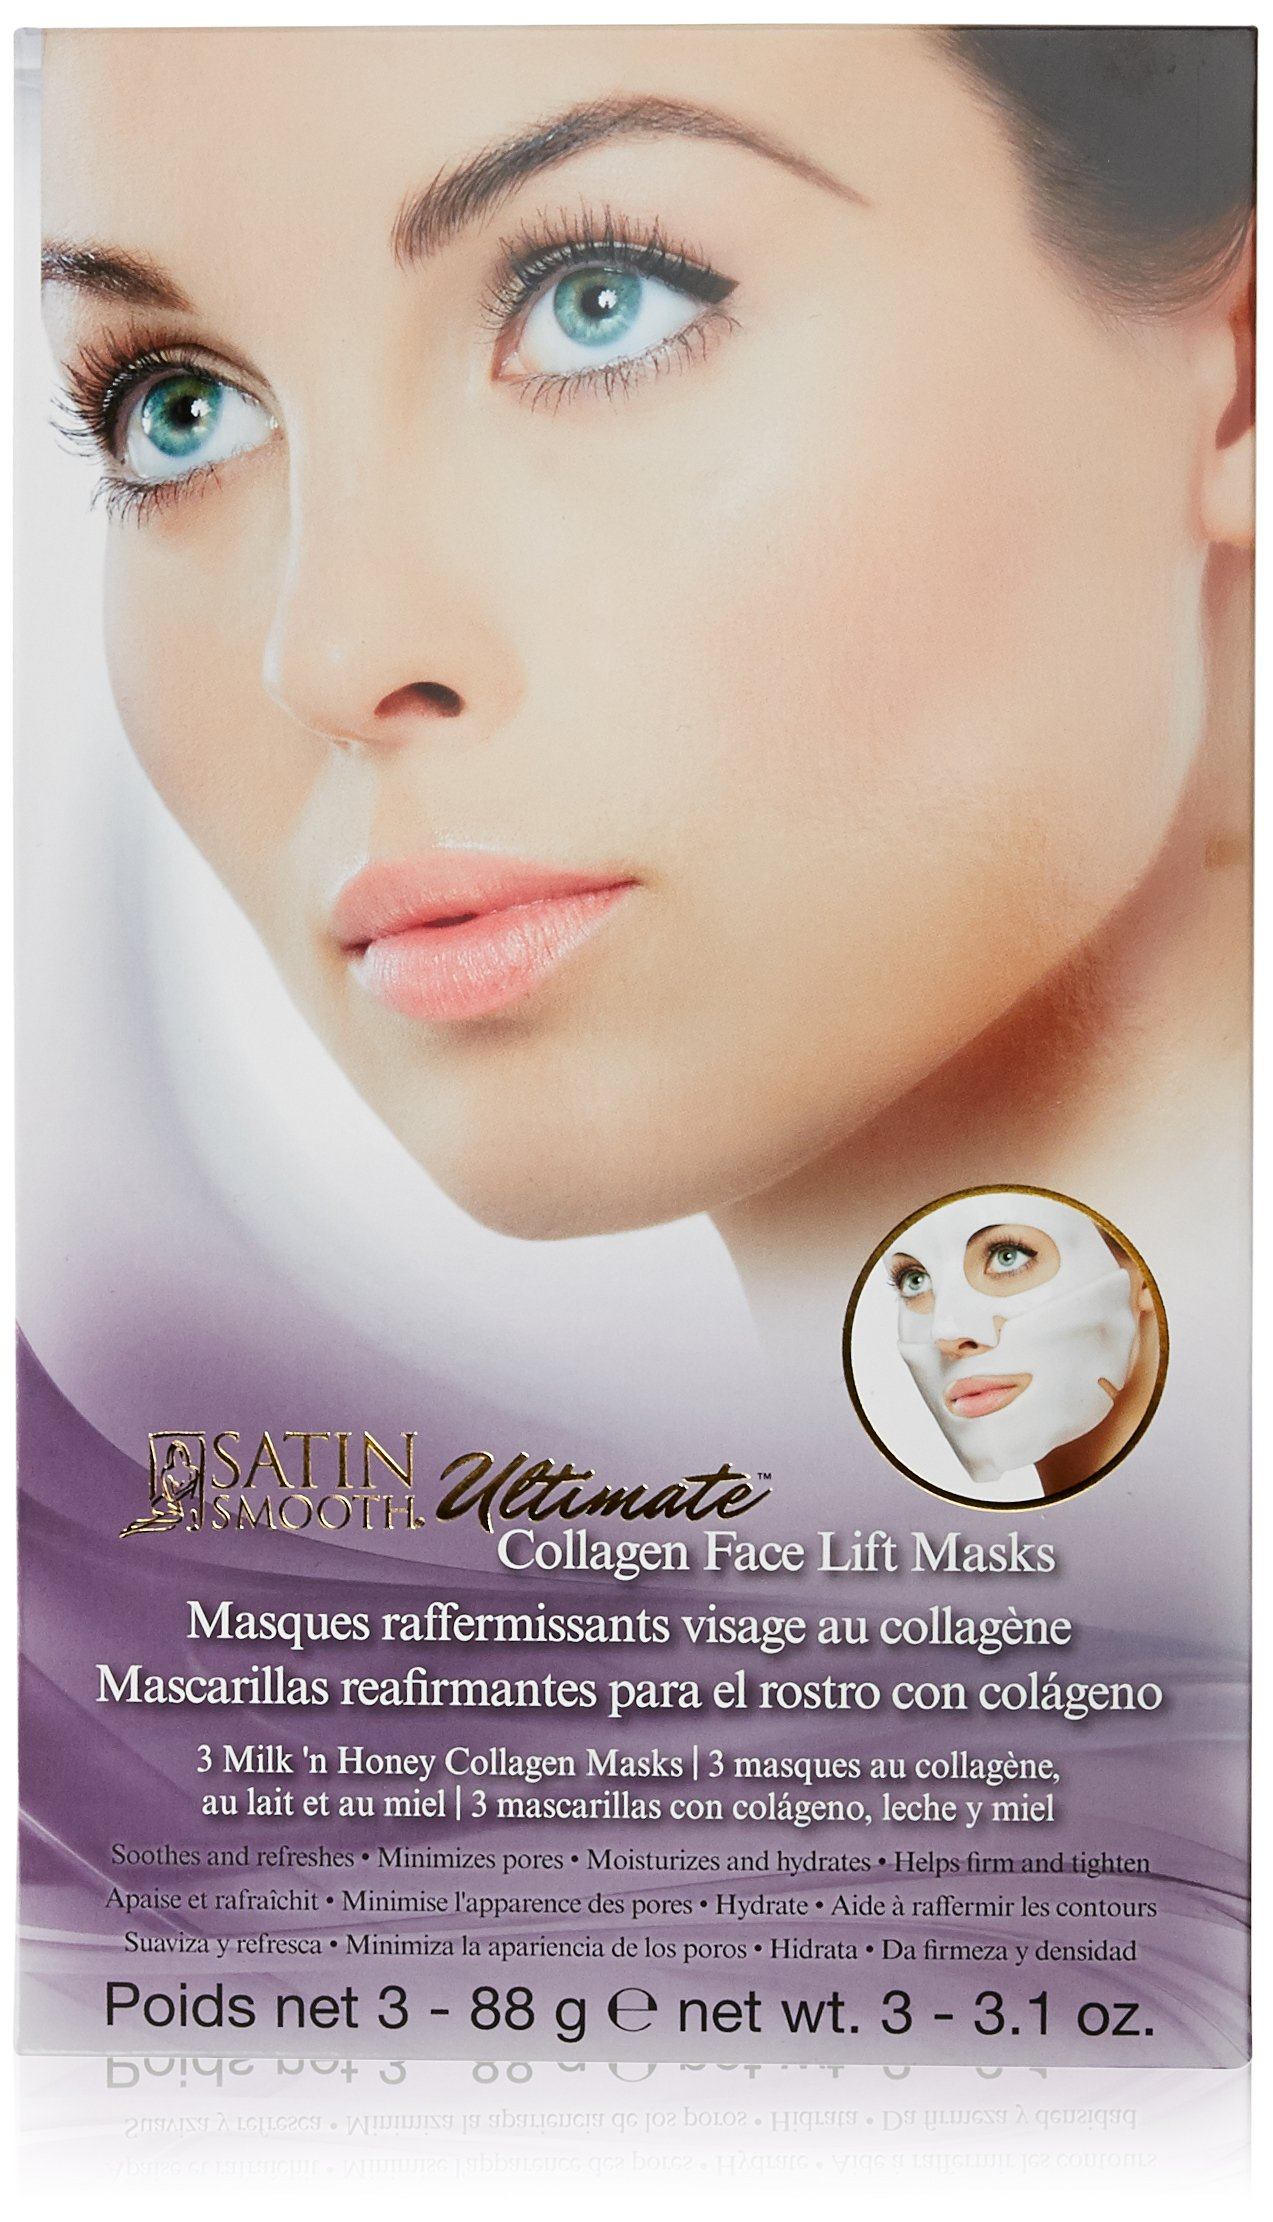 Satin Smooth Ultimate Eye Lift Collagen Masks for Sale